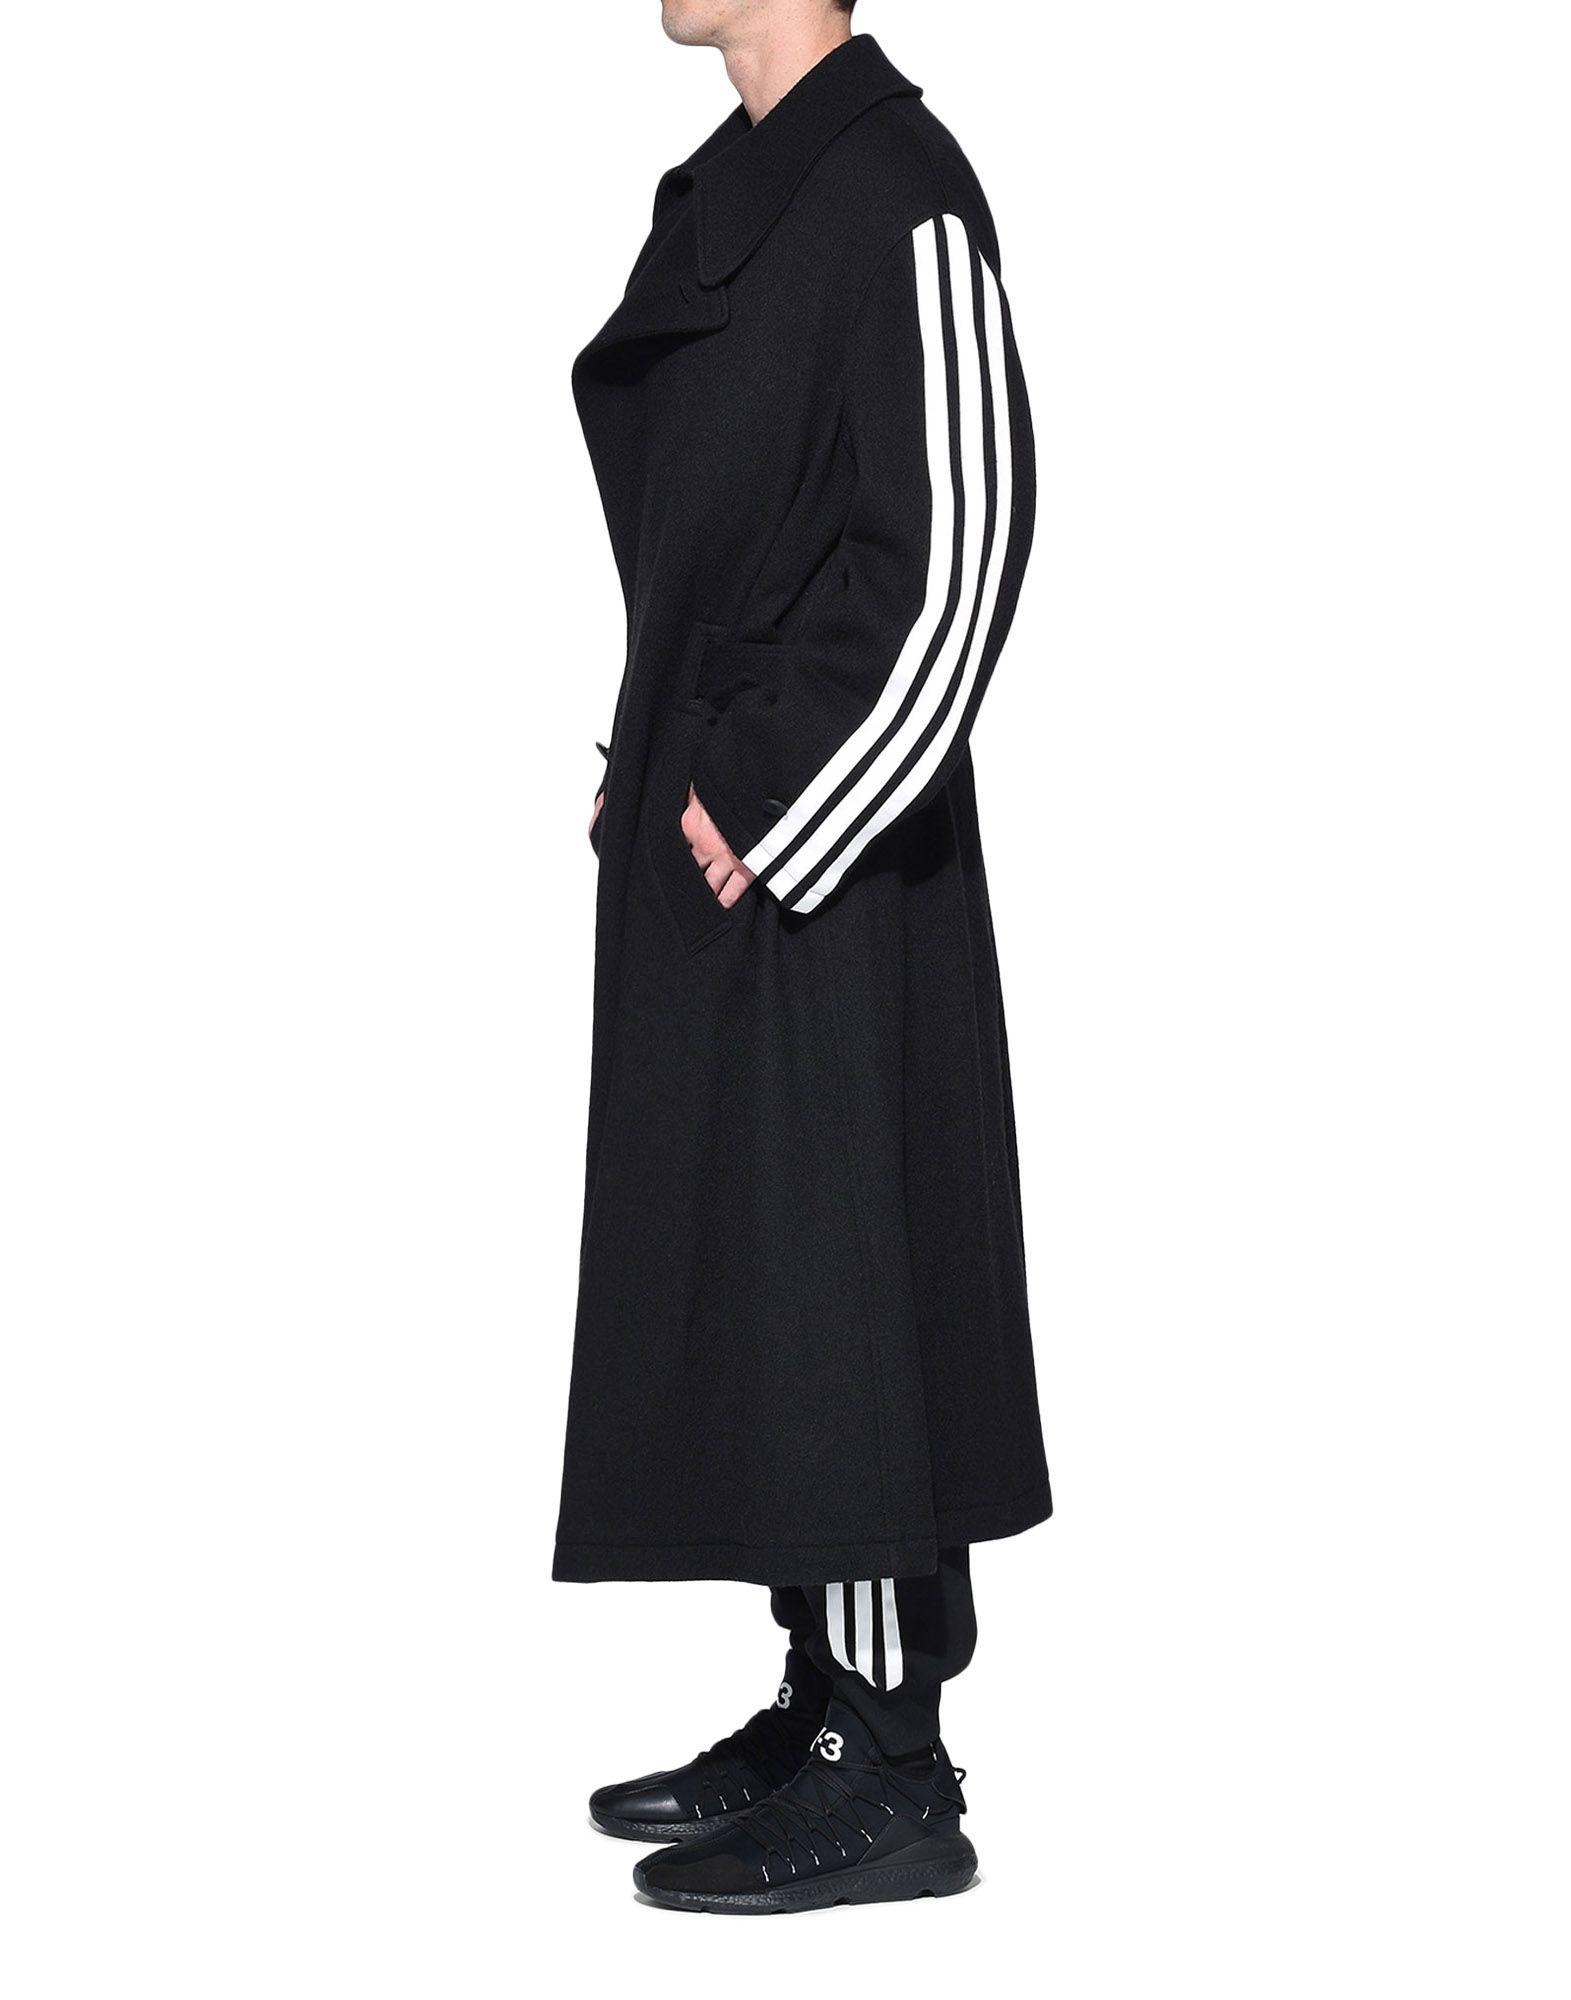 Y-3 Y-3 Tailored Wool Coat コート メンズ a